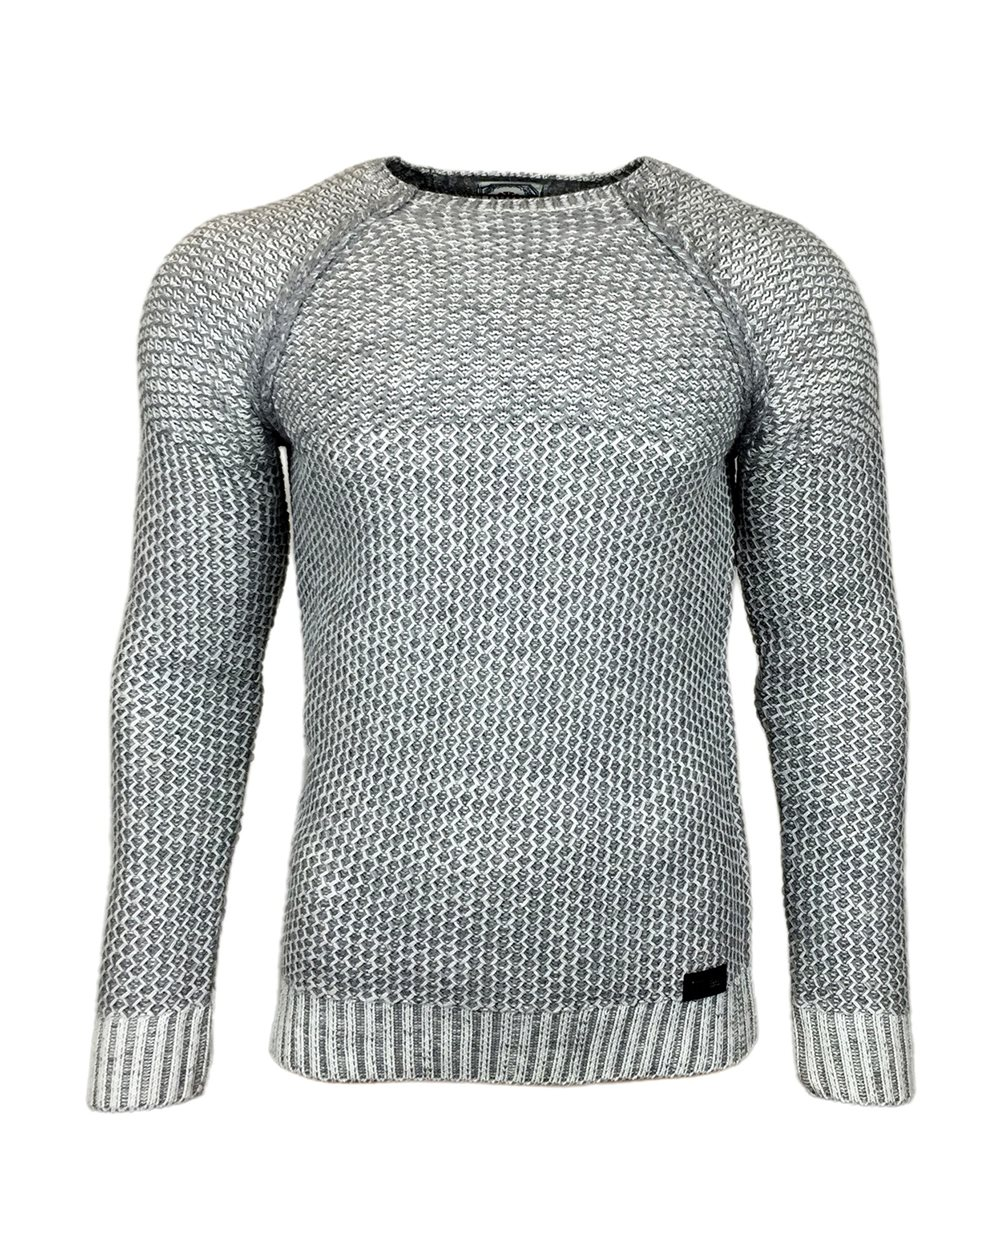 Subliminal Mode - Pull homme col arrondi grosse maille KD16060